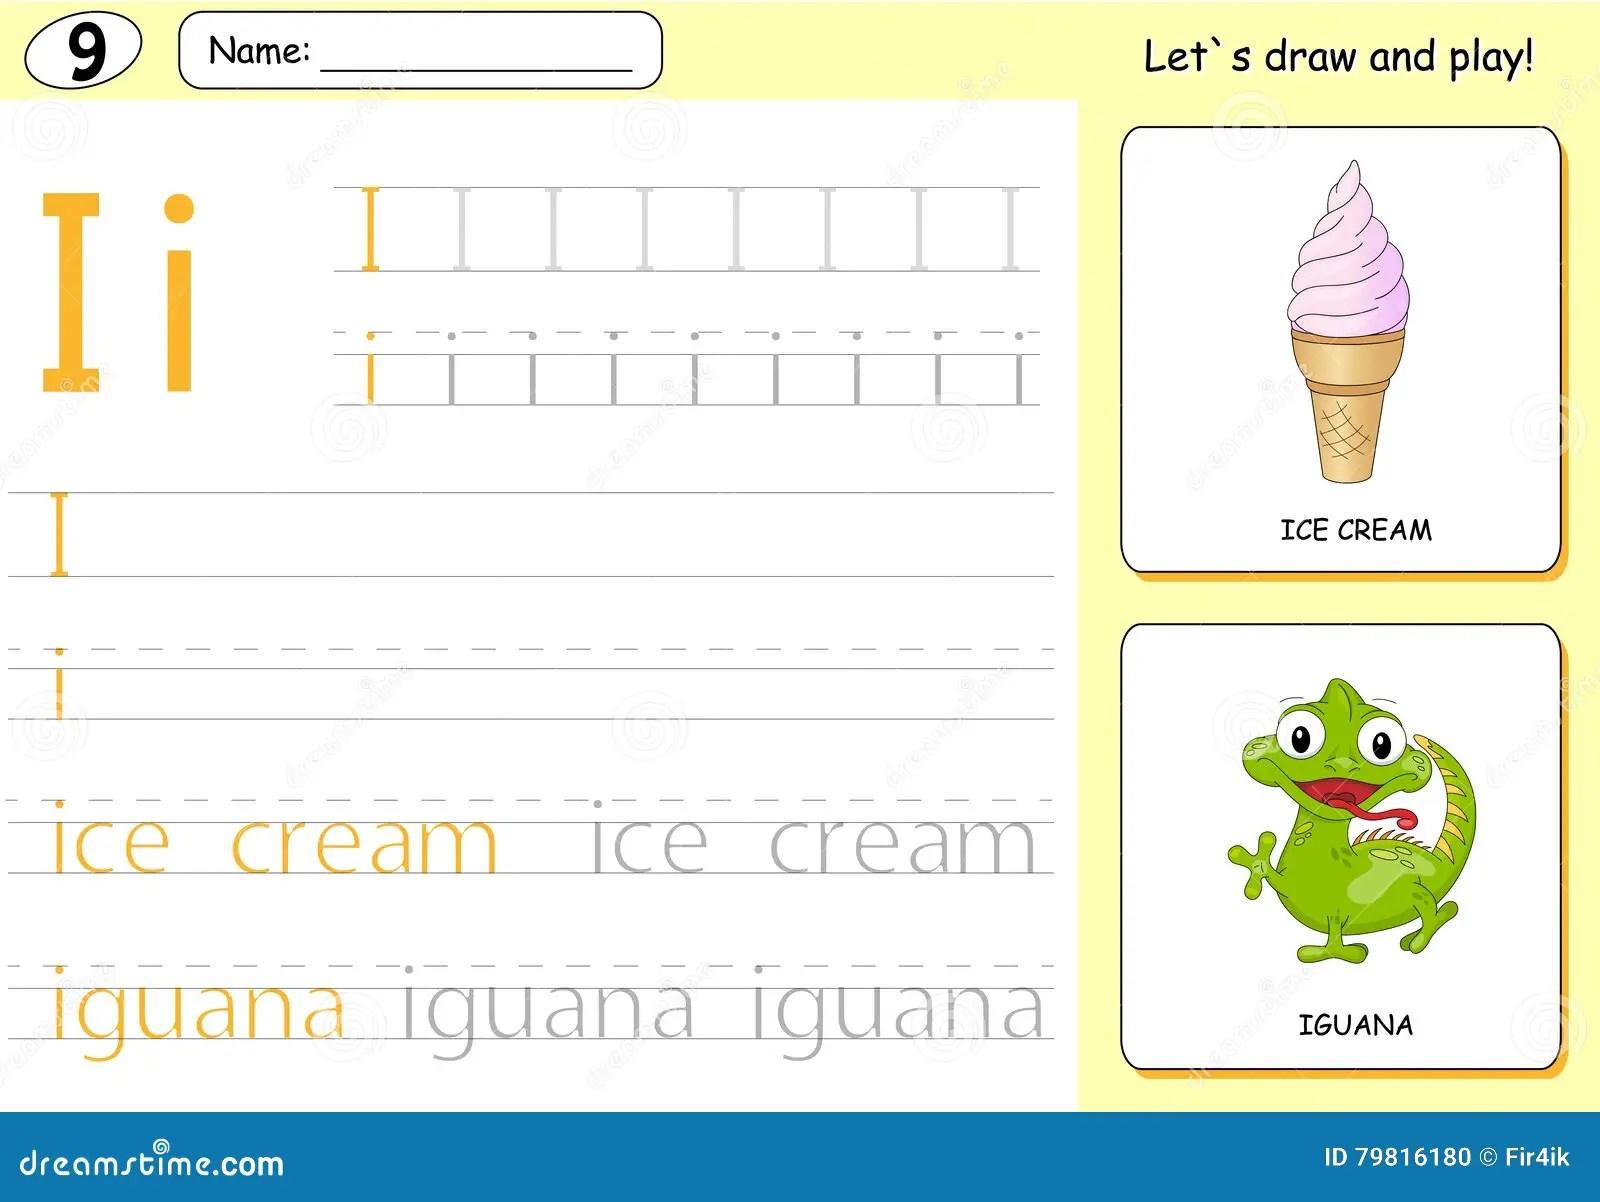 Cartoon Ice Cream And Iguana Alphabet Tracing Worksheet